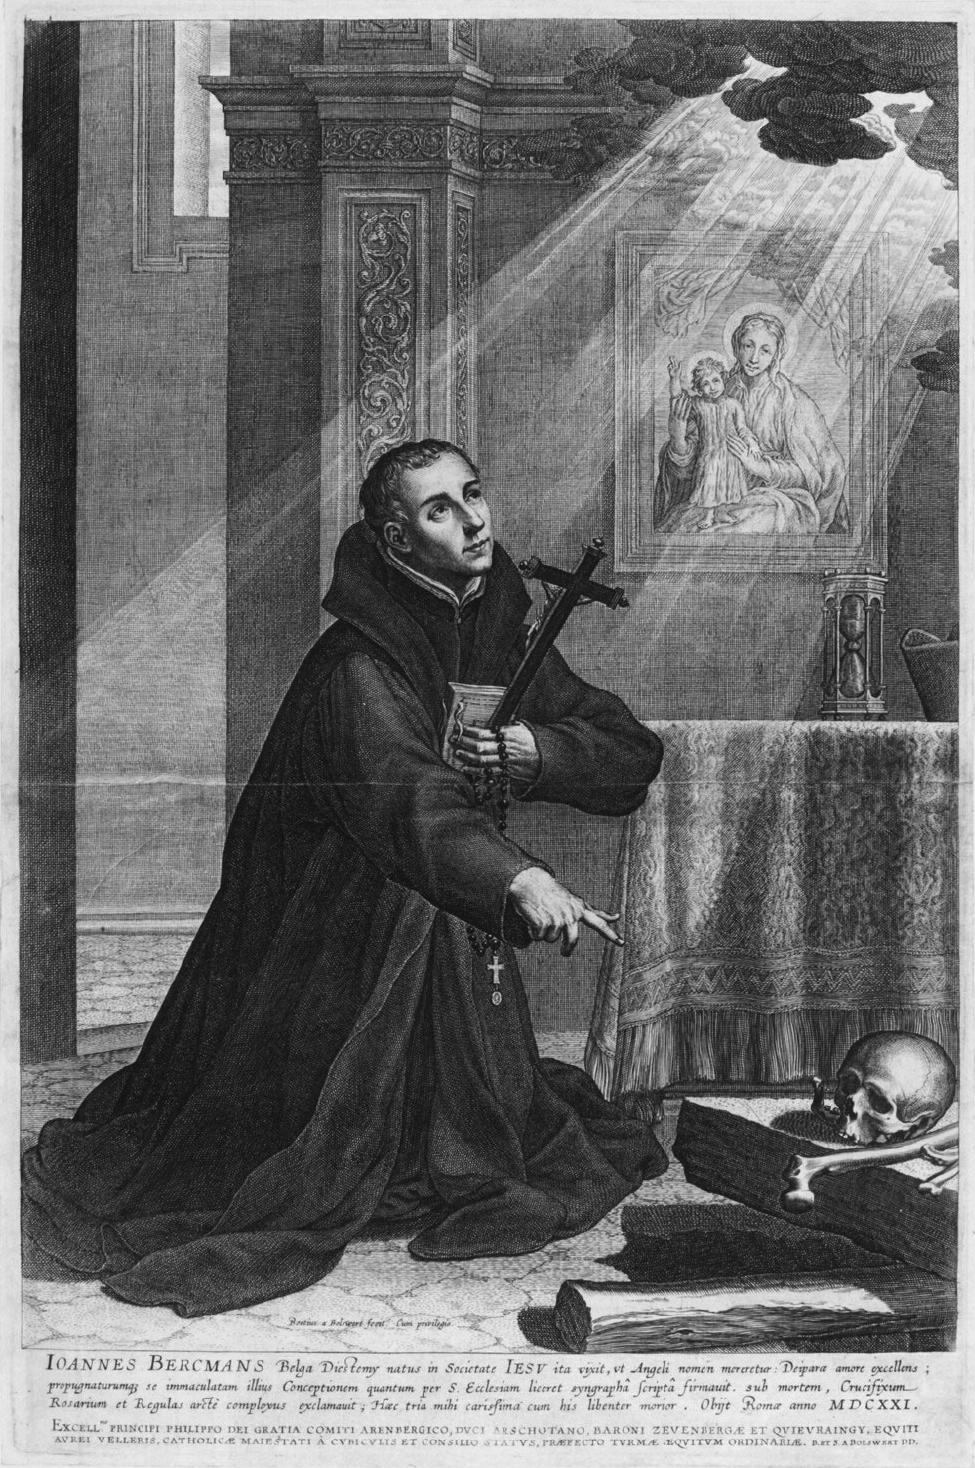 Portrait of the Jesuit Jan Berchmans